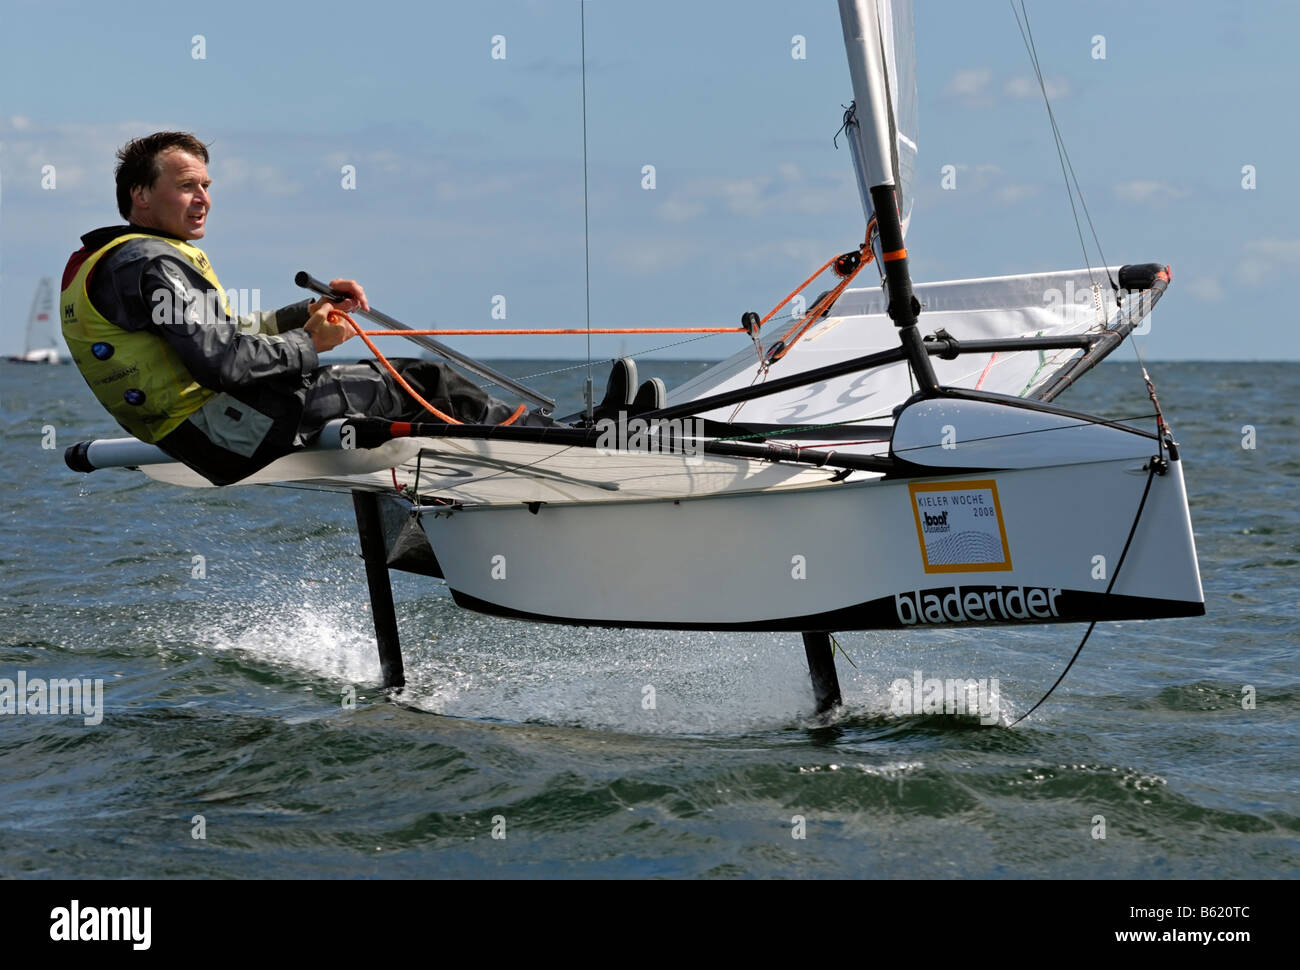 Sailor competing in the regatta for the sailing boat category, International Moth Class, Kiel Week 2008, Kiel, Schleswig - Stock Image